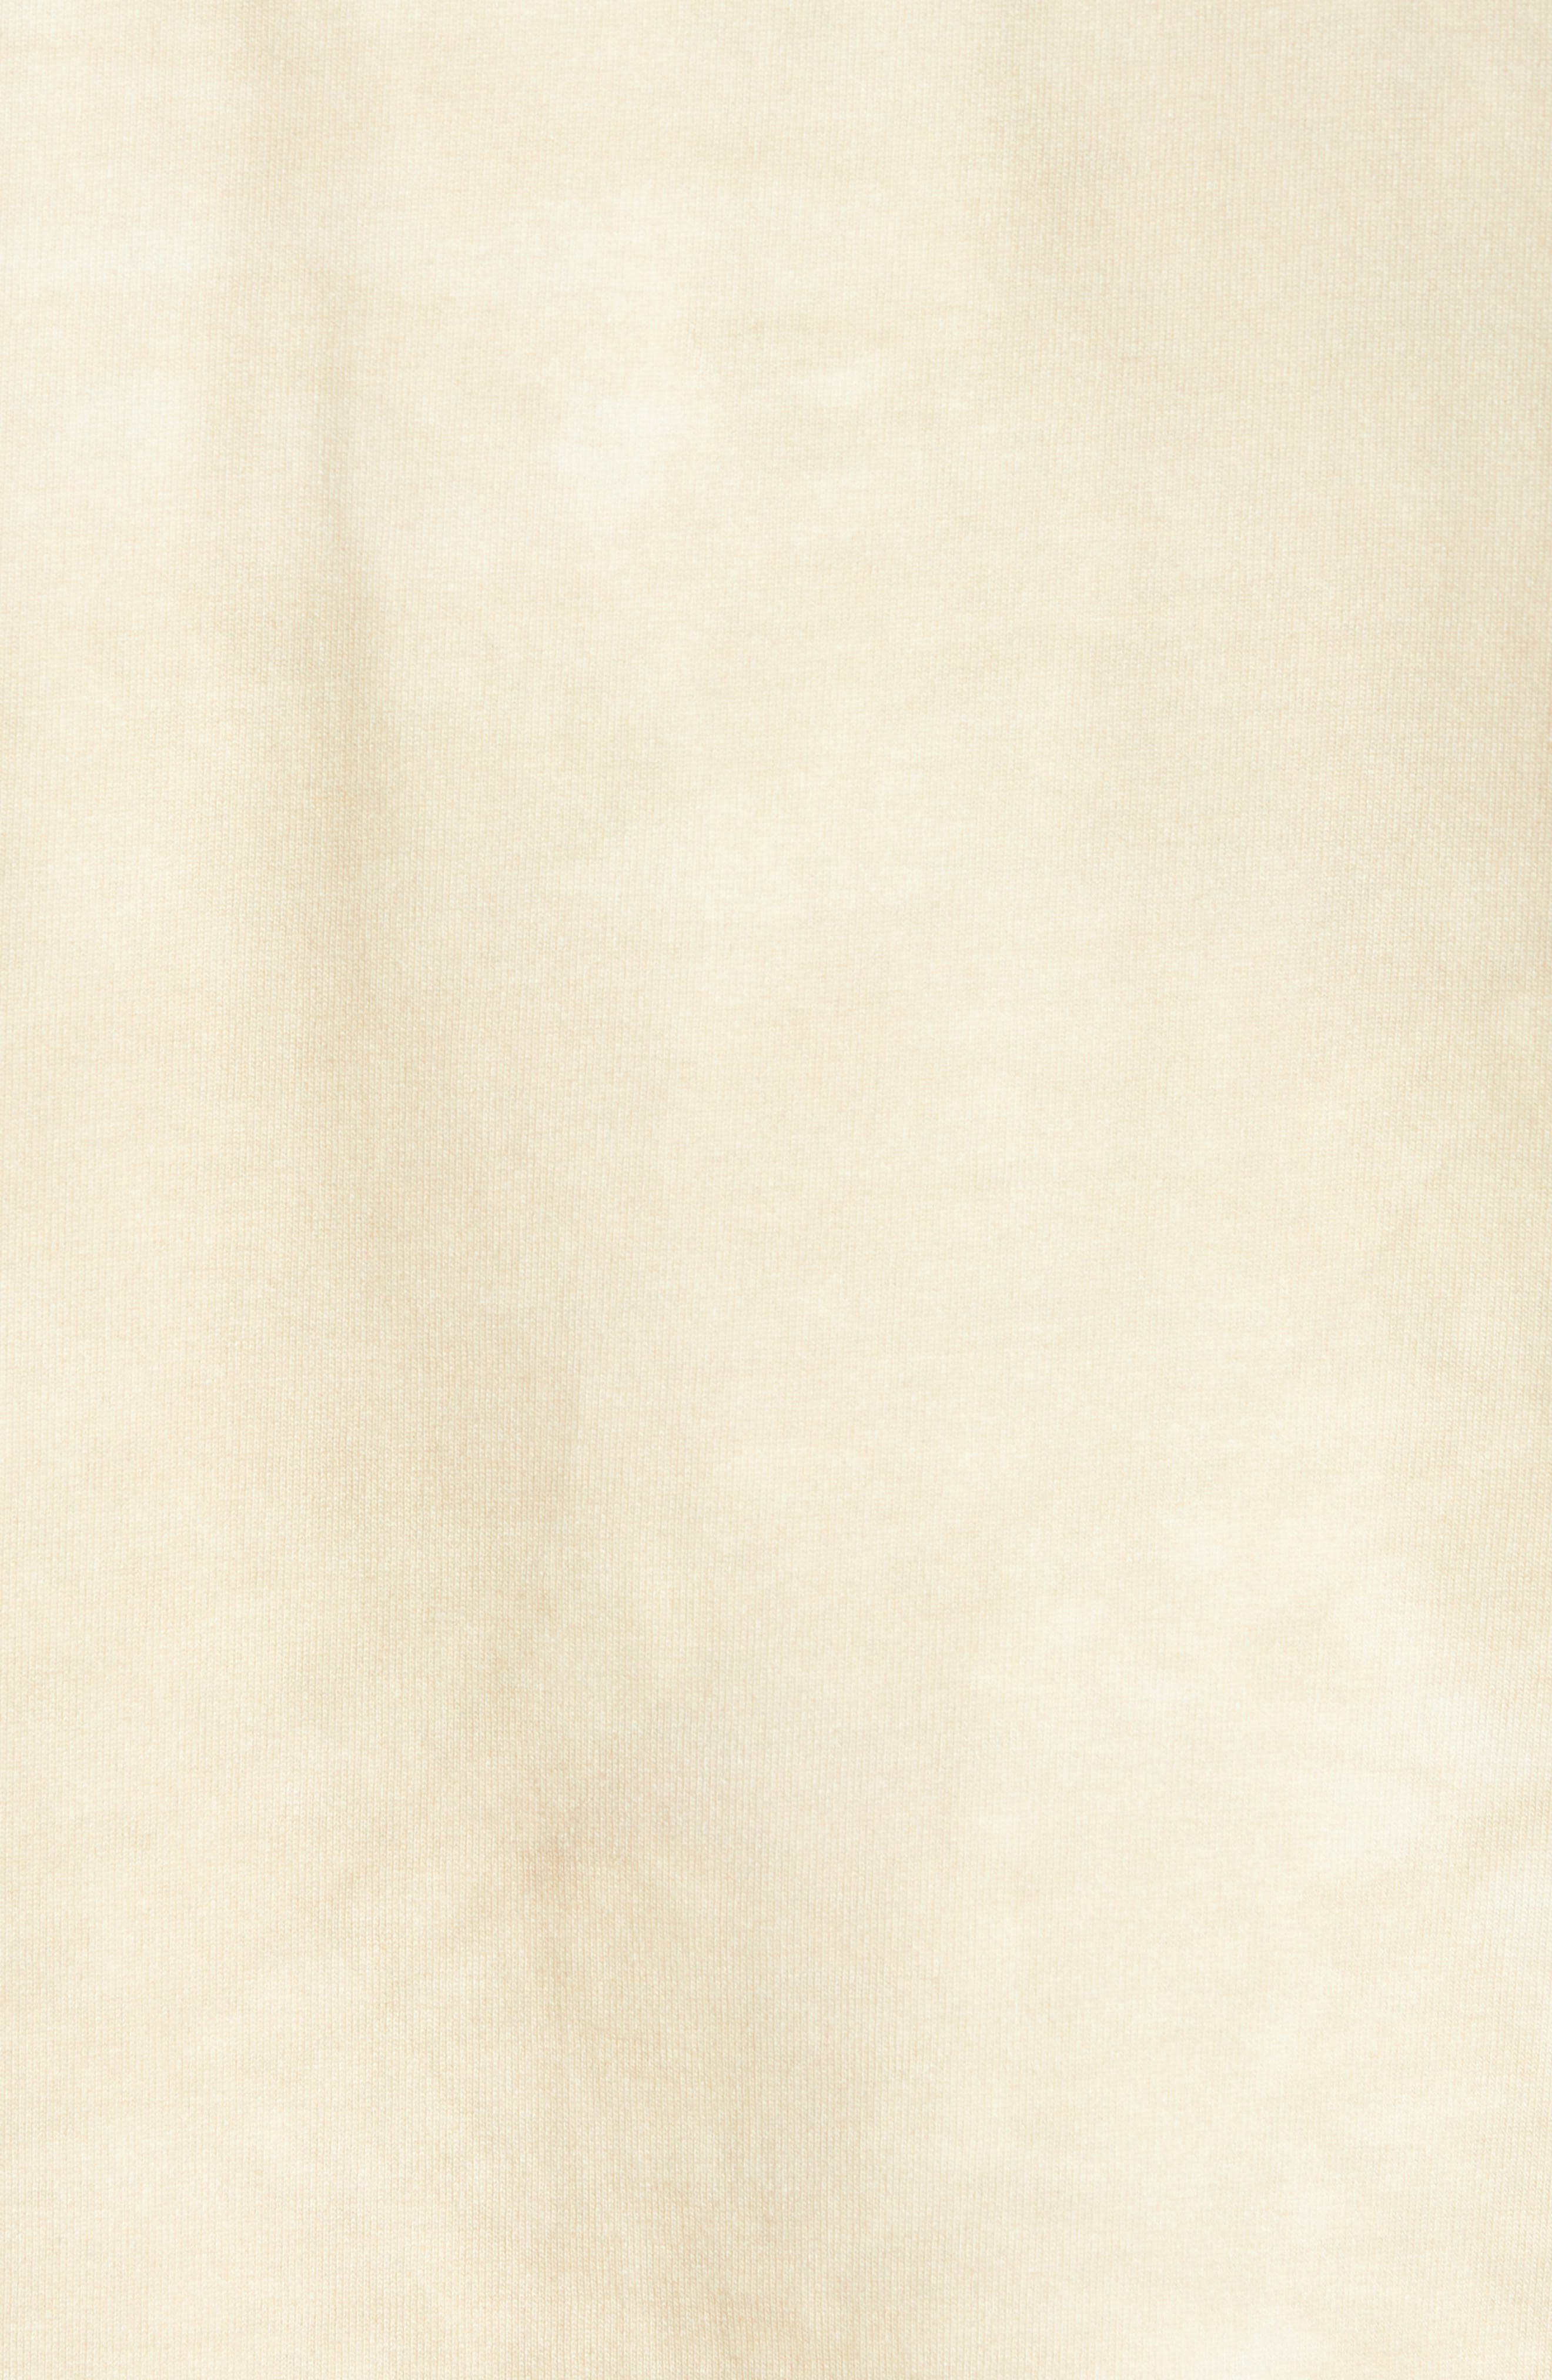 G-Star Cyrer Animal Loose T-Shirt,                             Alternate thumbnail 5, color,                             SAND